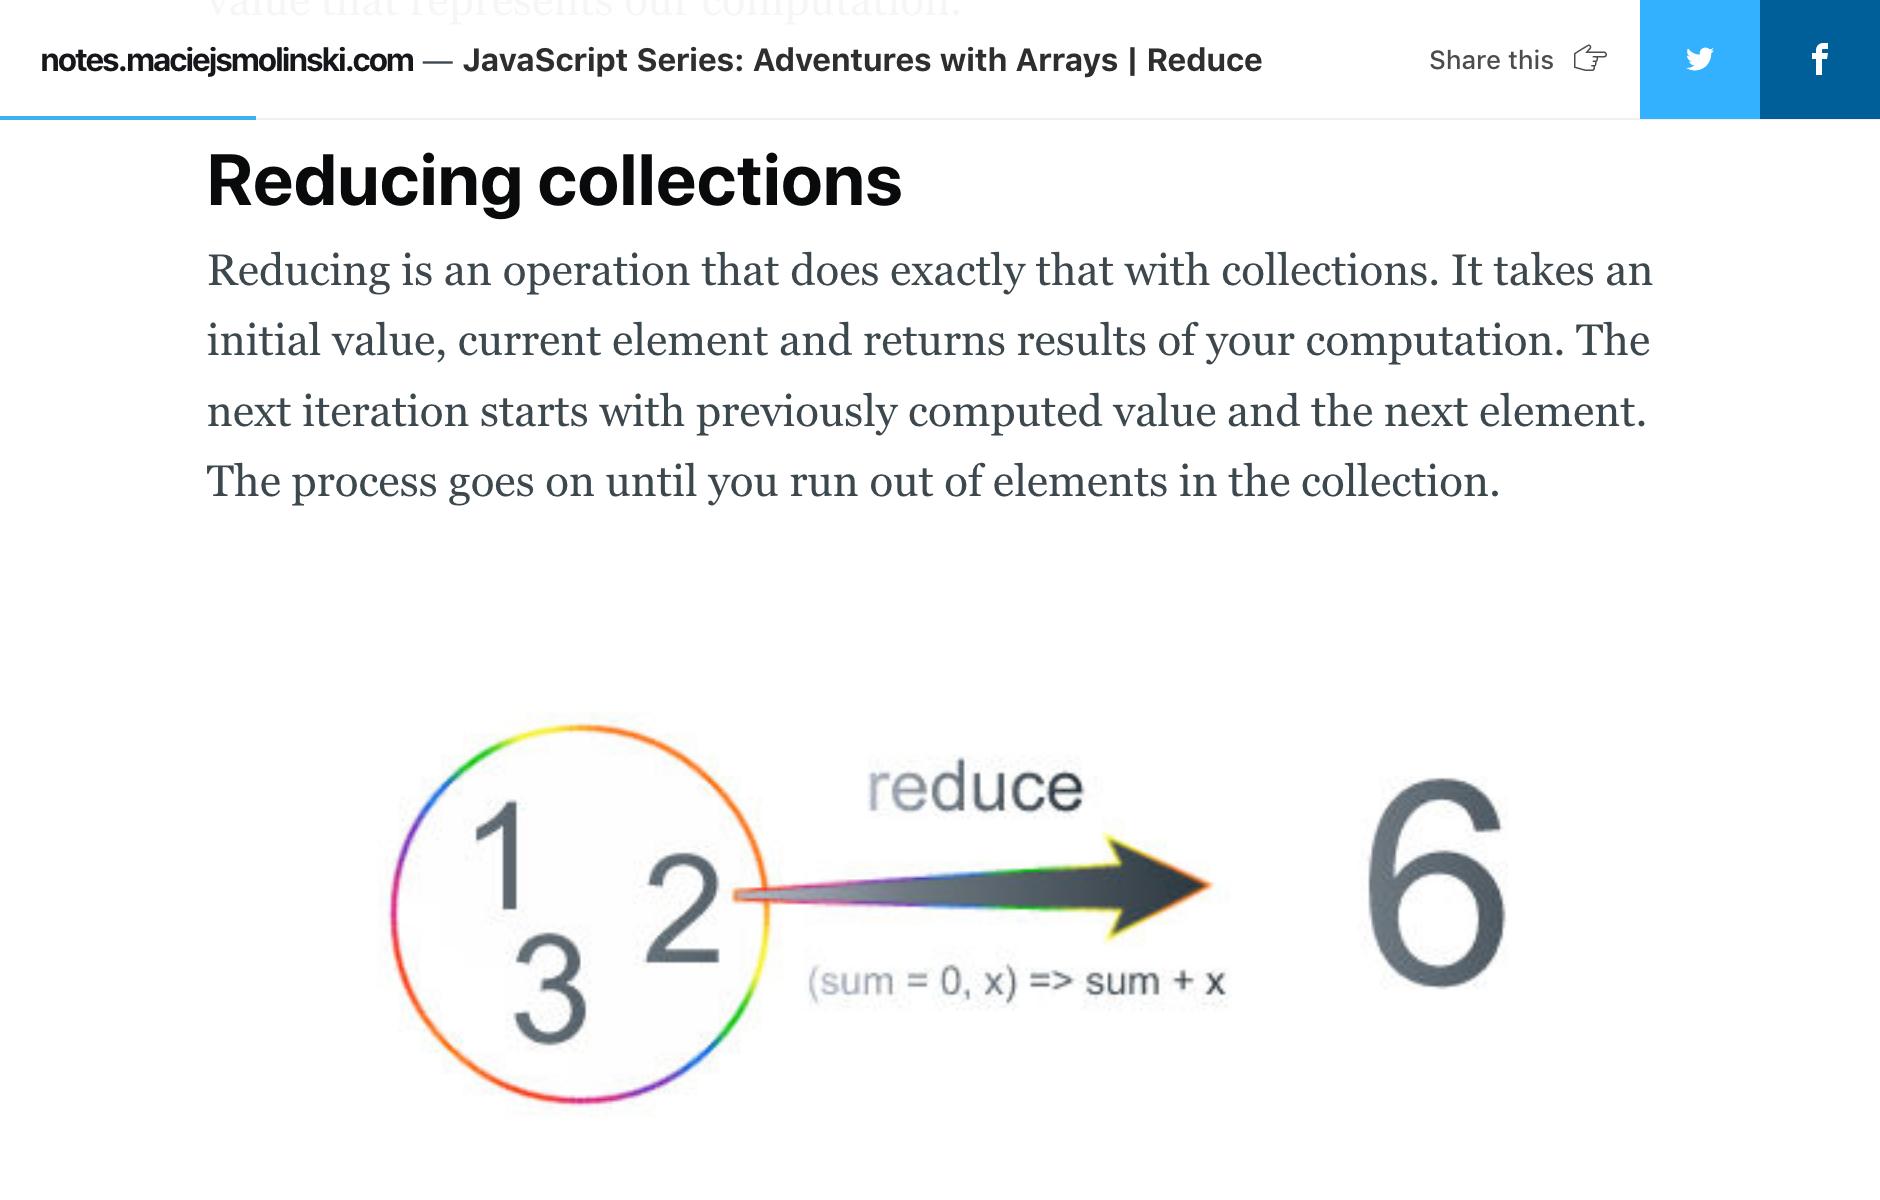 JavaScript Series Adventures with Arrays   Reduce